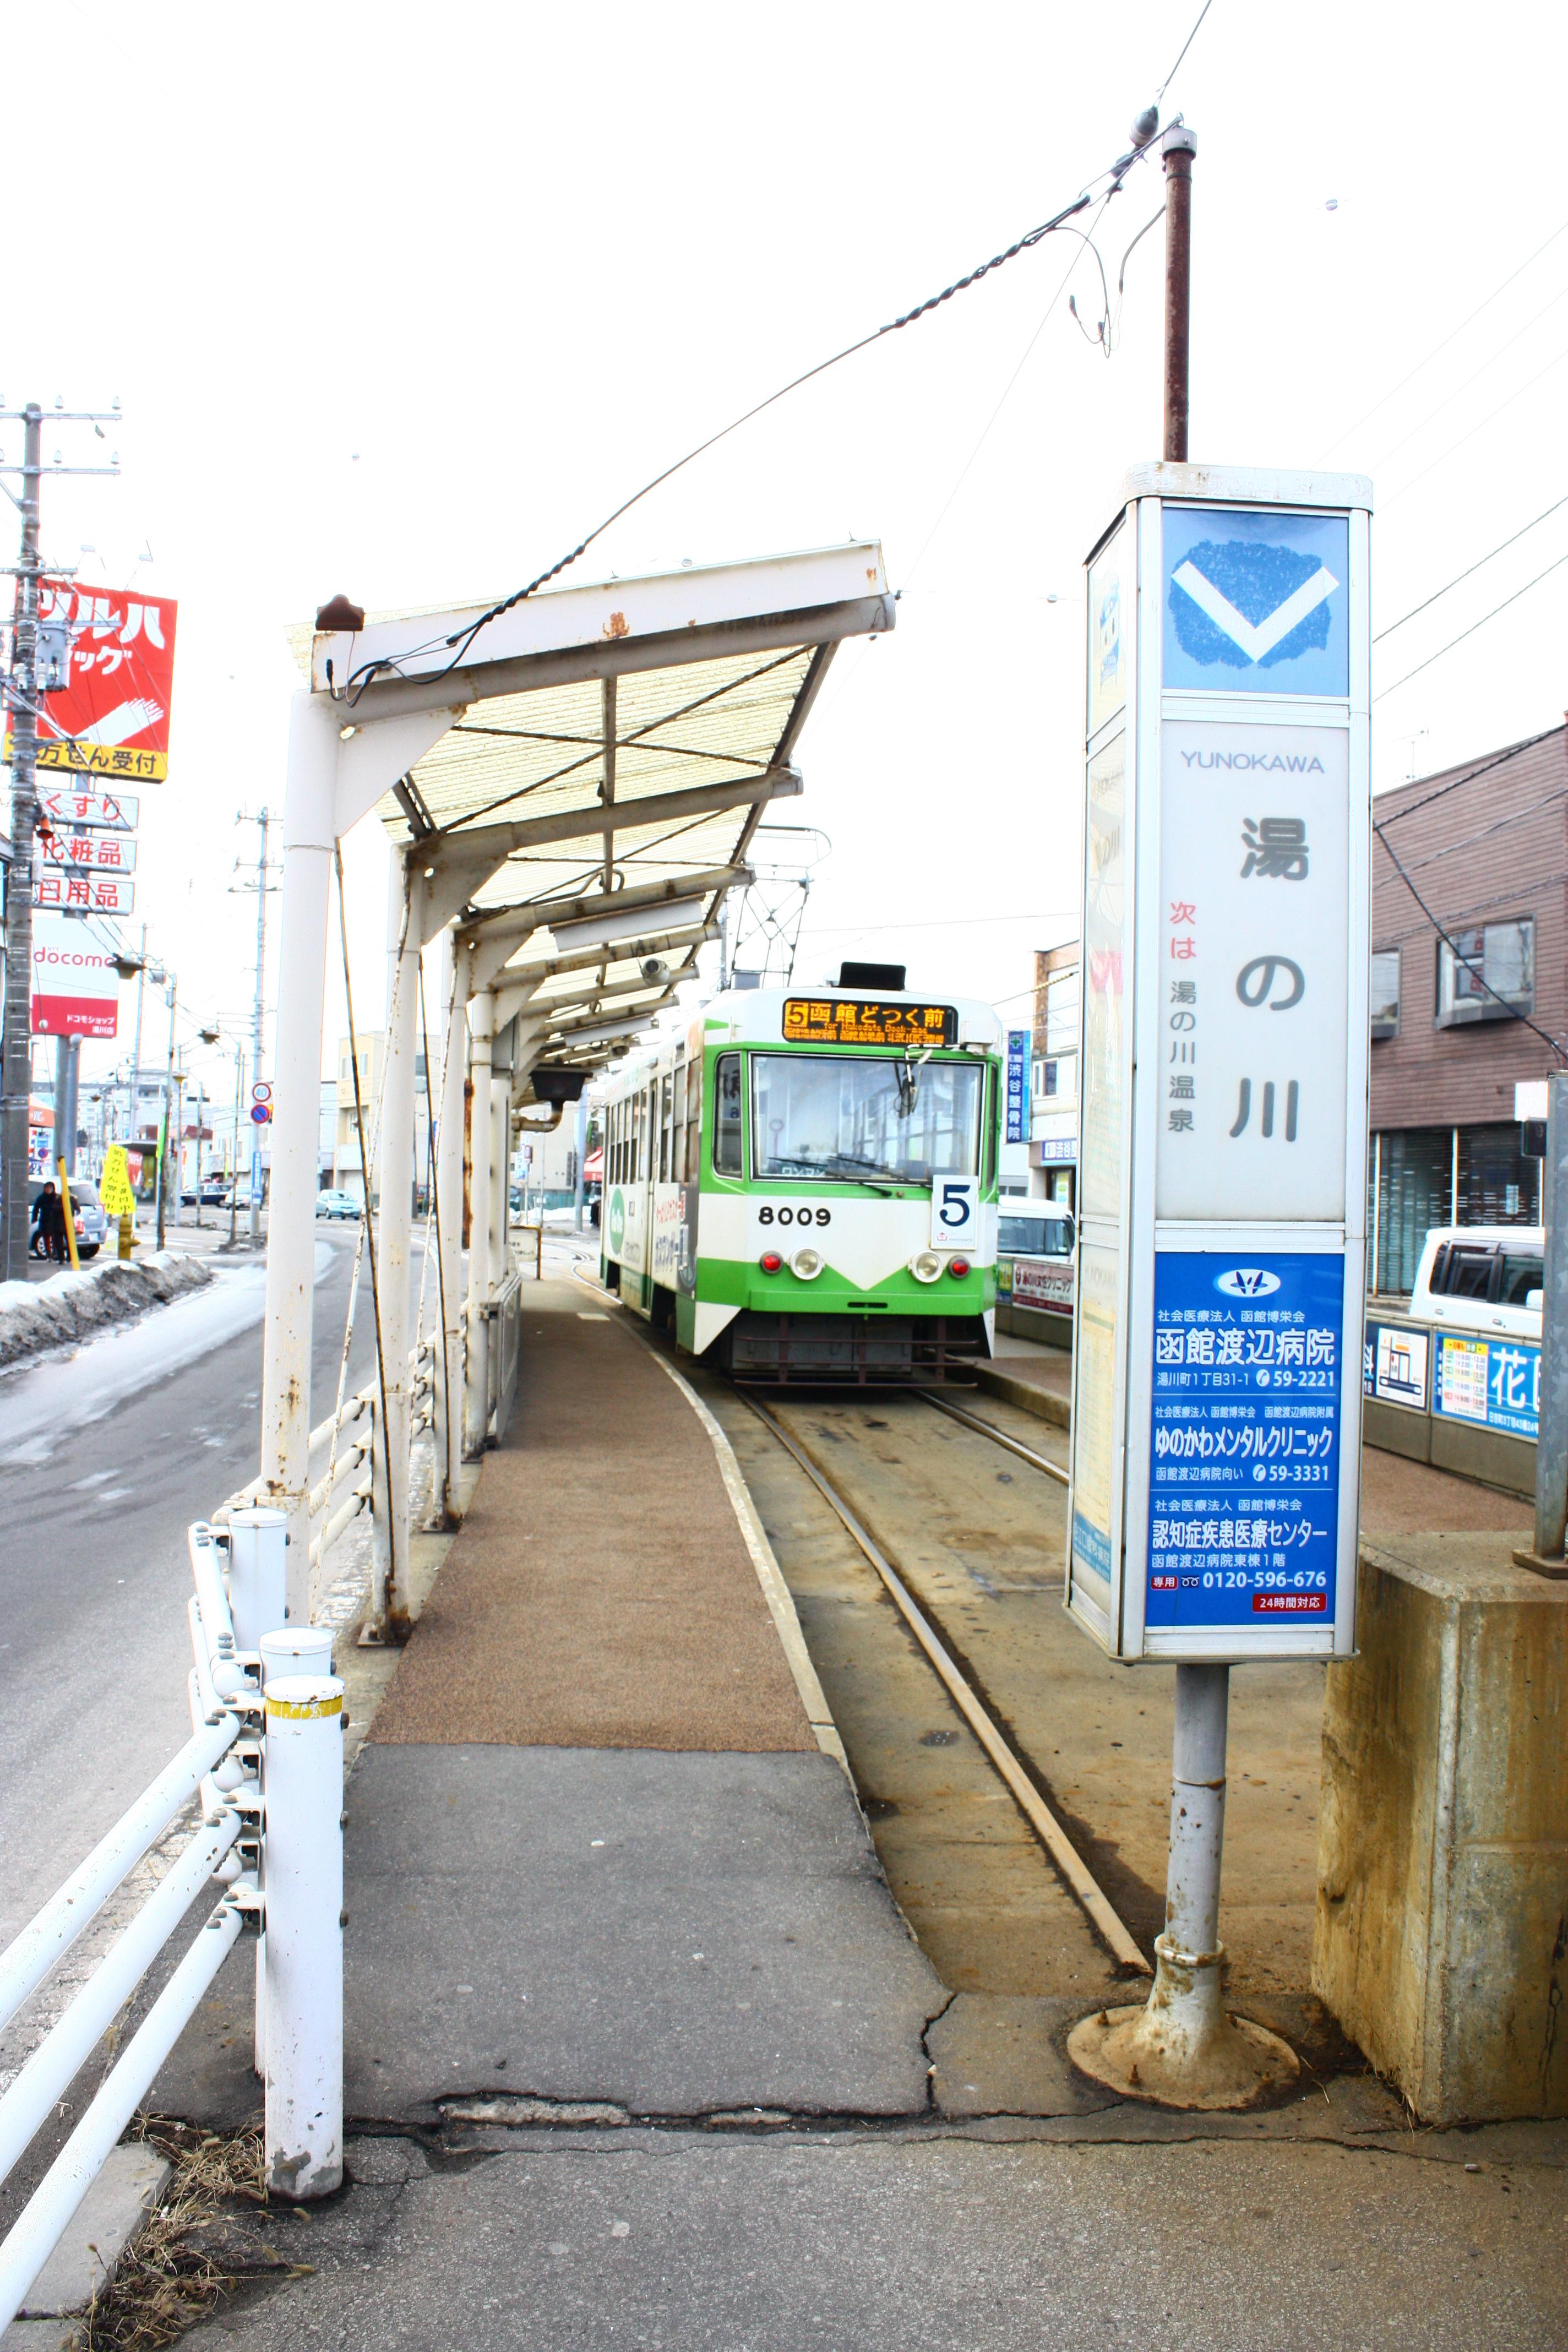 https://upload.wikimedia.org/wikipedia/commons/e/ec/Hakodate_city_tram_Yunokawa_station.JPG